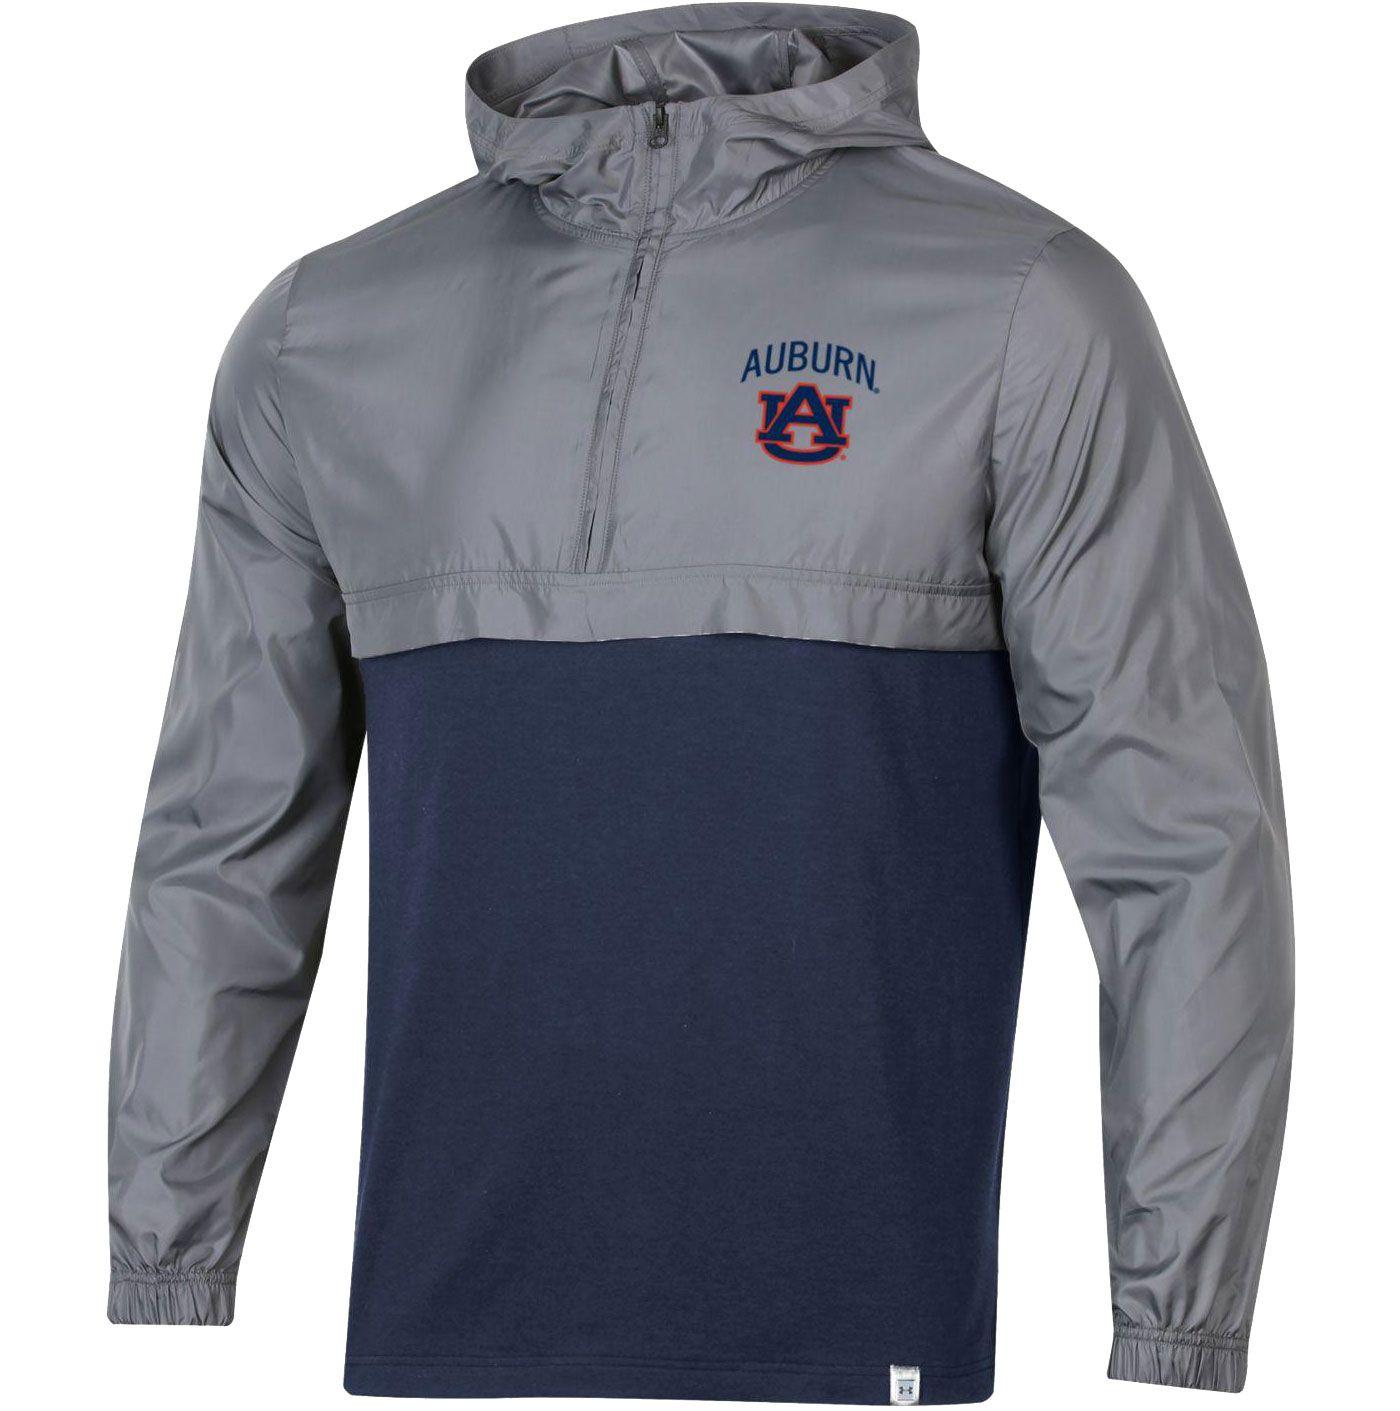 Under Armour Men's Auburn Tigers Grey Sportstyle Woven Quarter-Zip Jacket